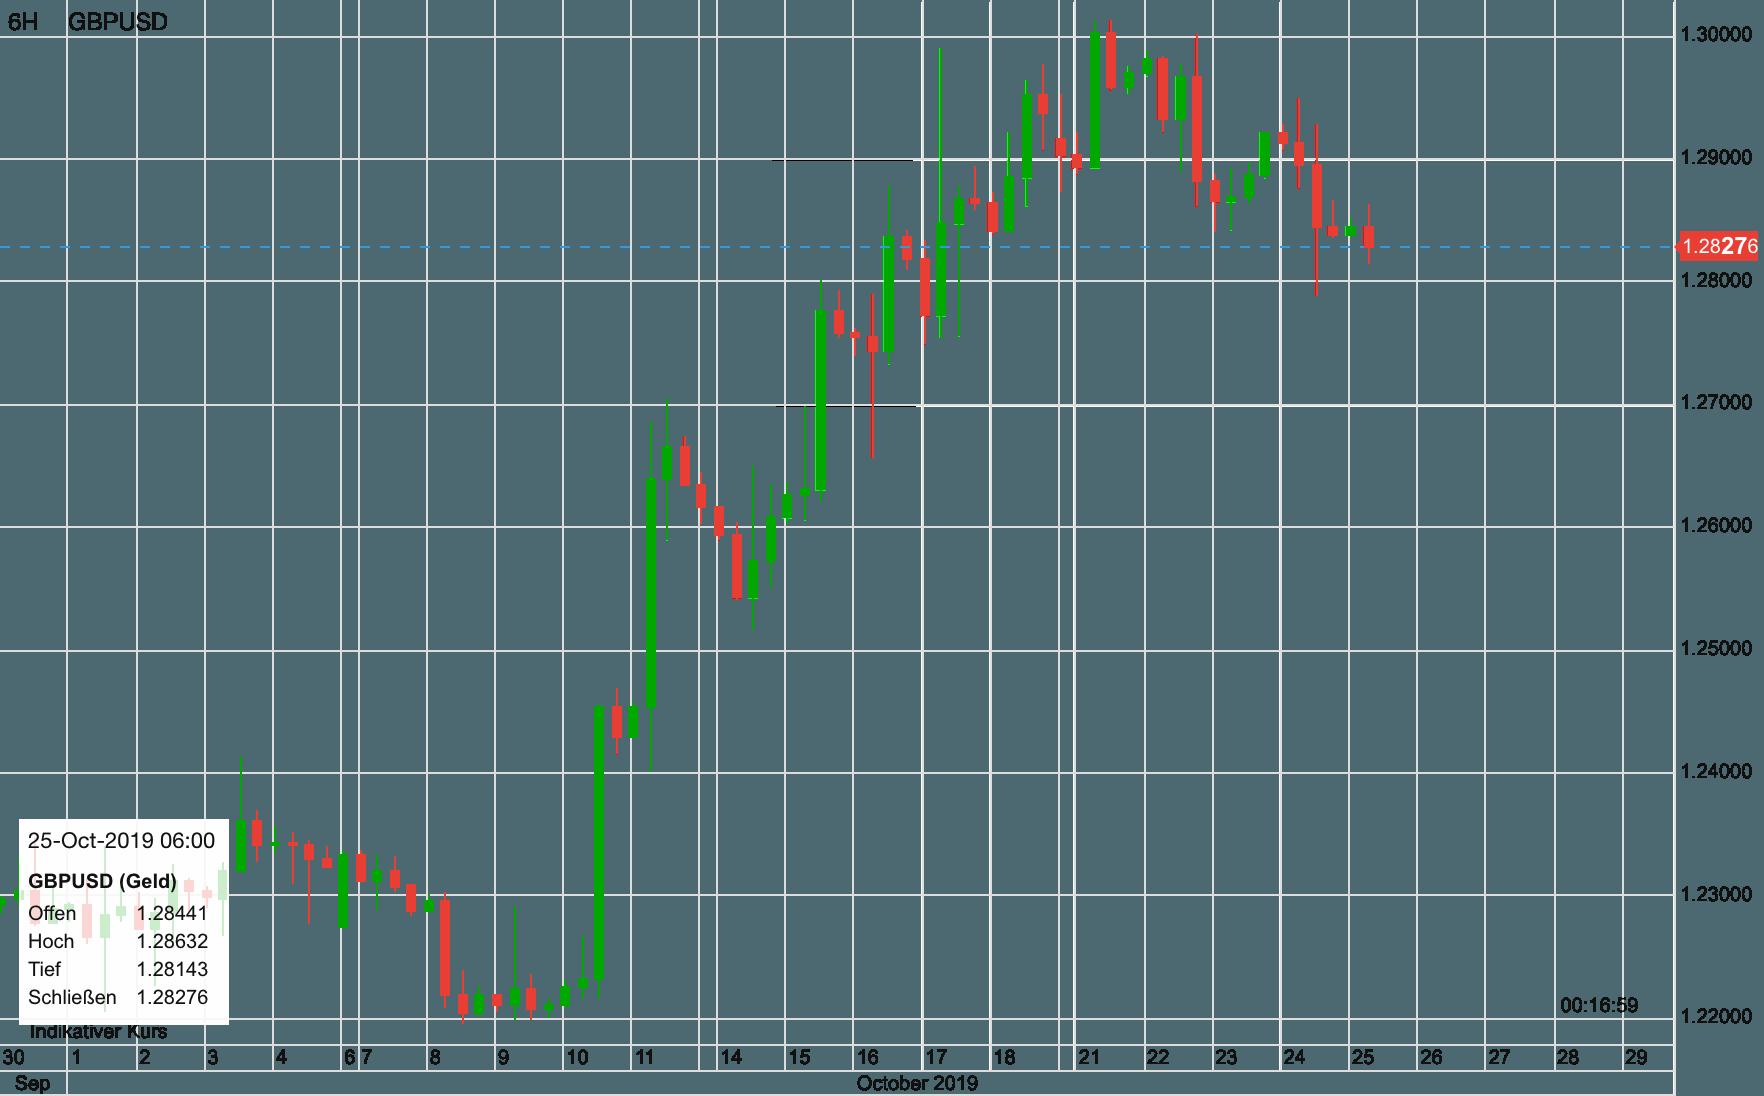 Pfund vs USD seit Anfang Oktober